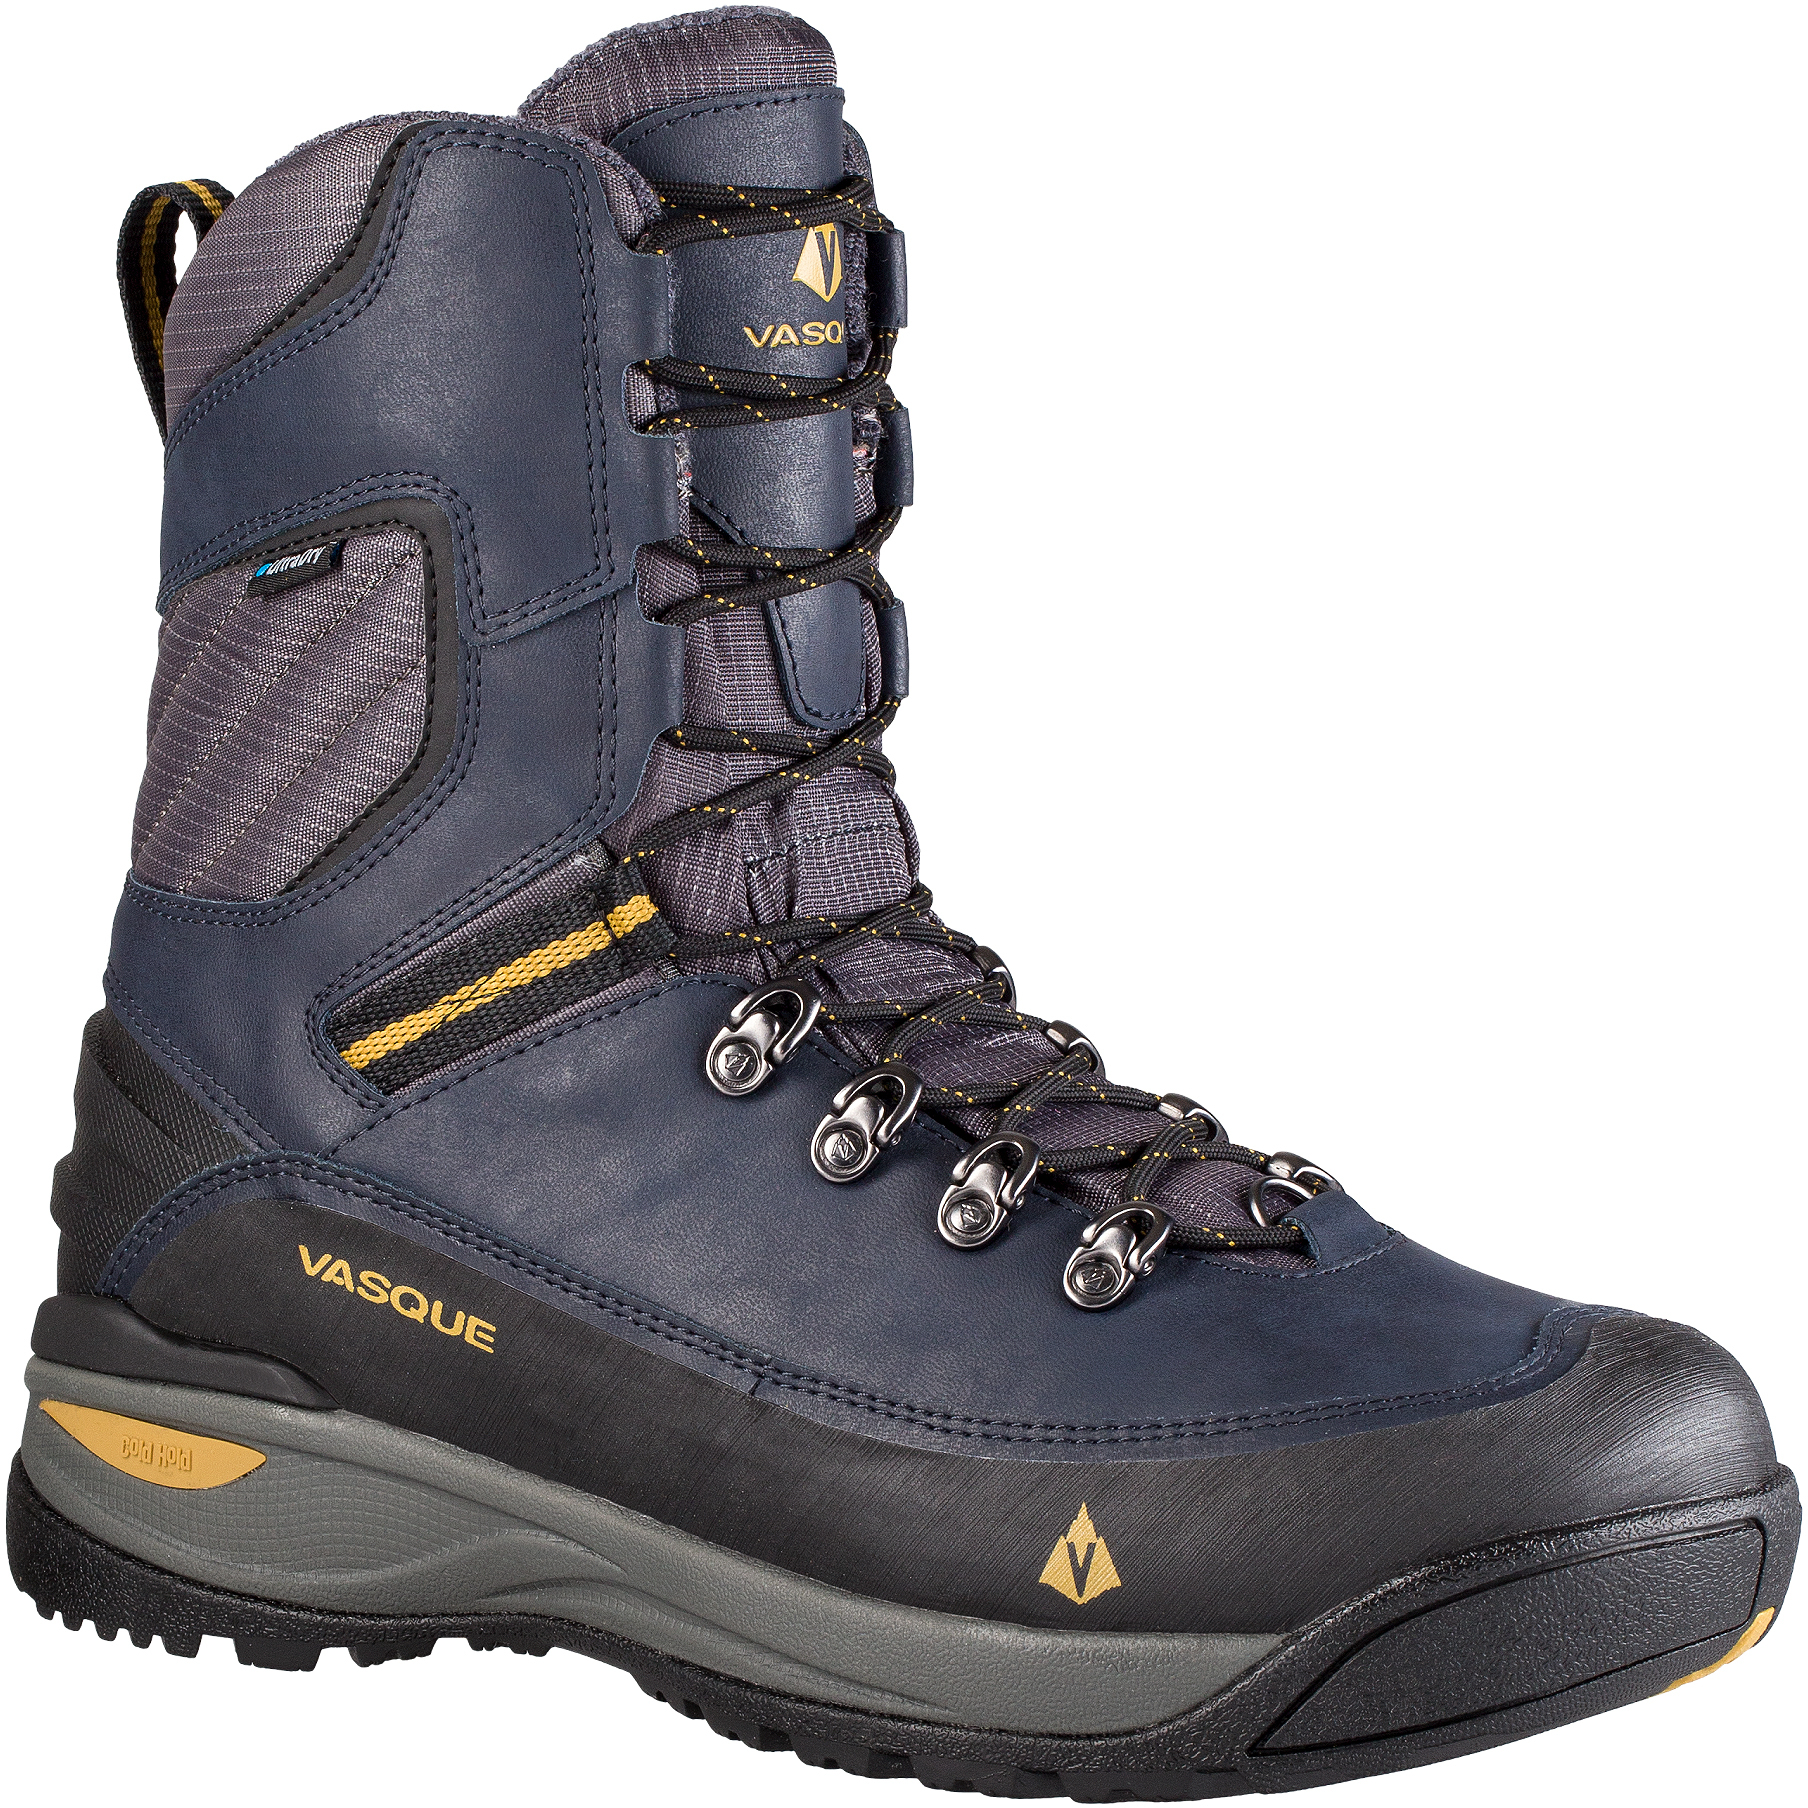 0a13f5373 Vasque Snowburban II UltraDry Winter Boot - Men s